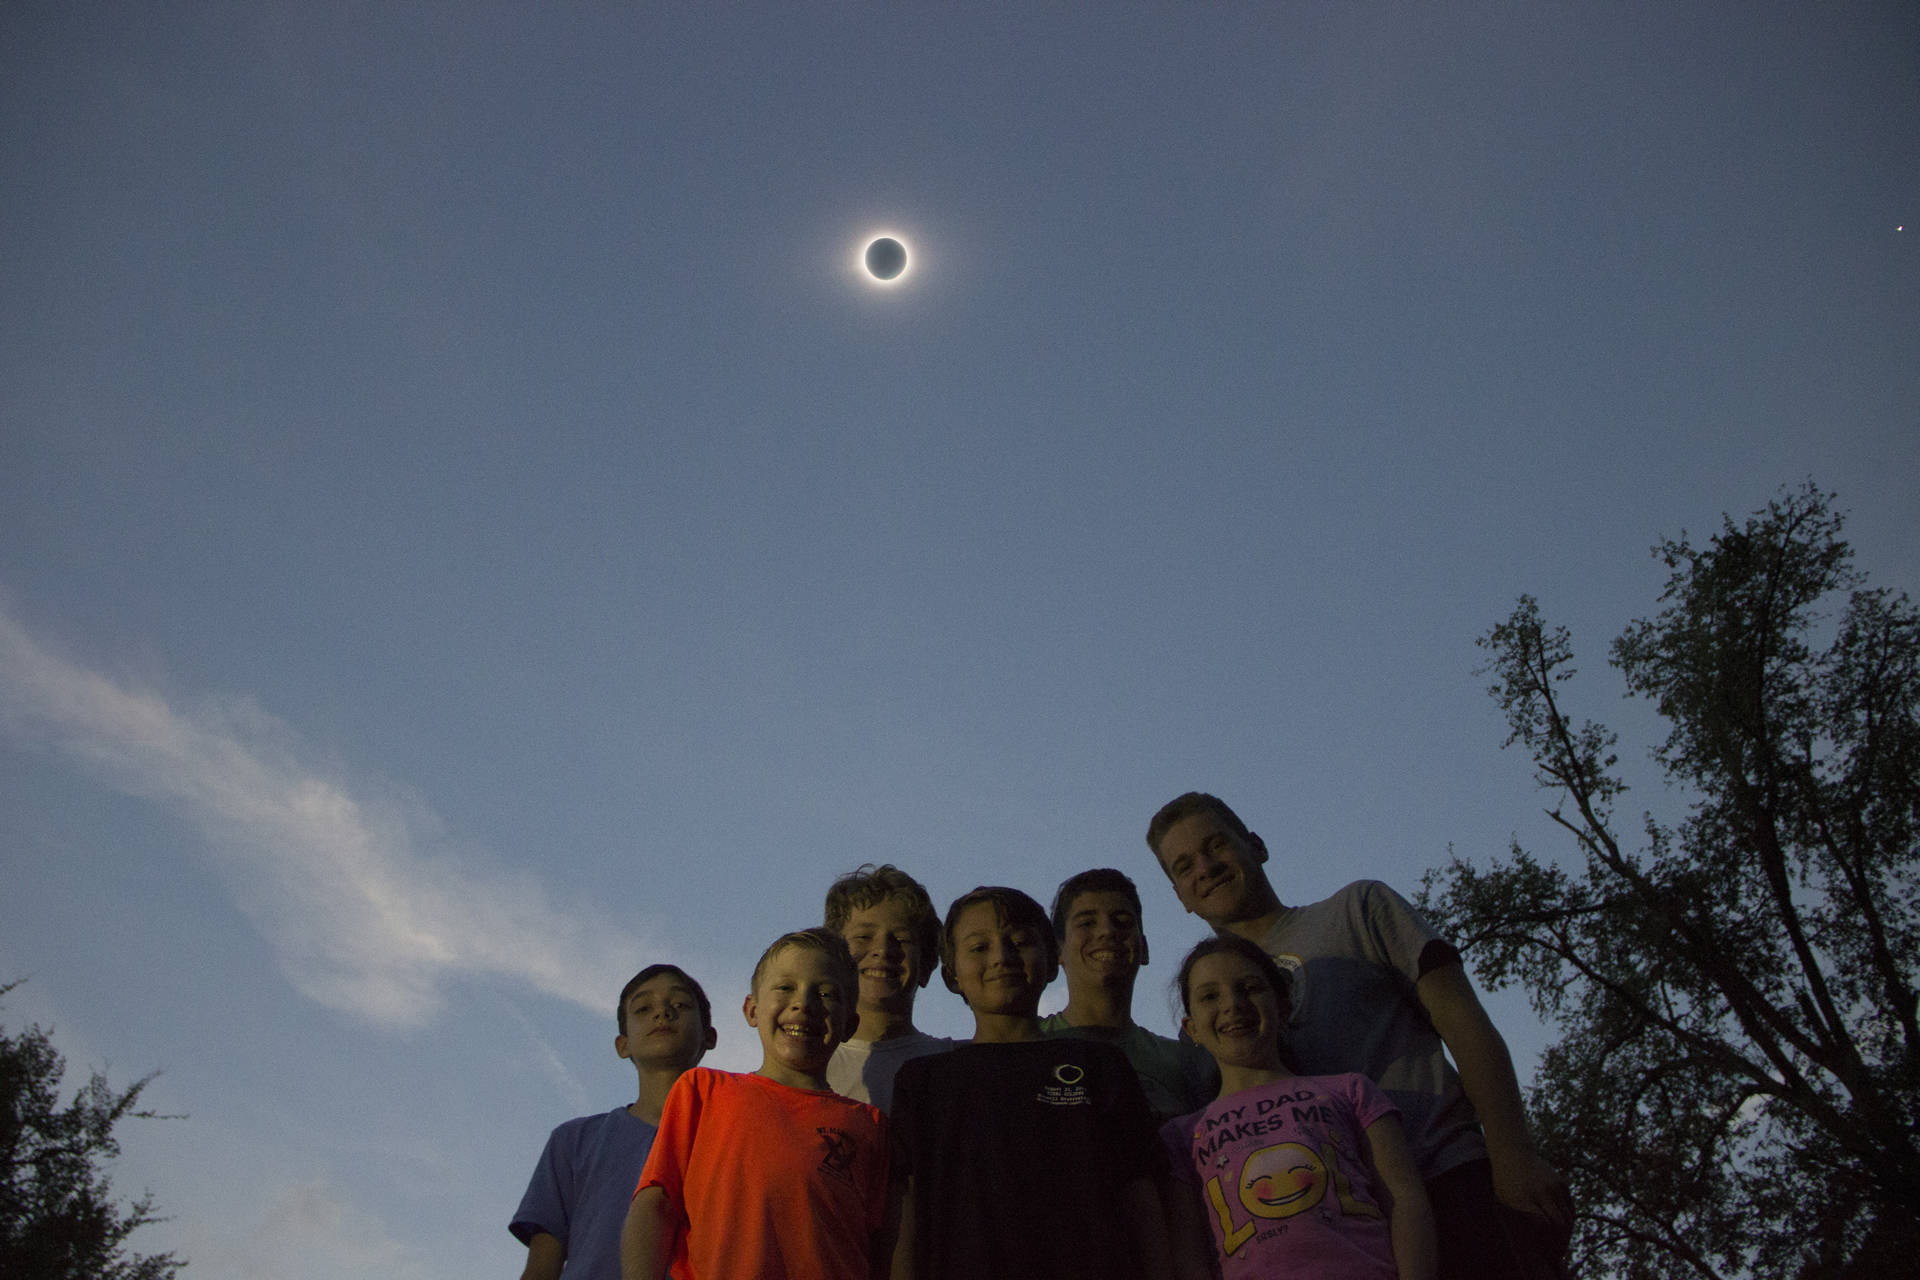 54b2f24110559eec31d2_boys-lit-eclipse-corrected.jpg